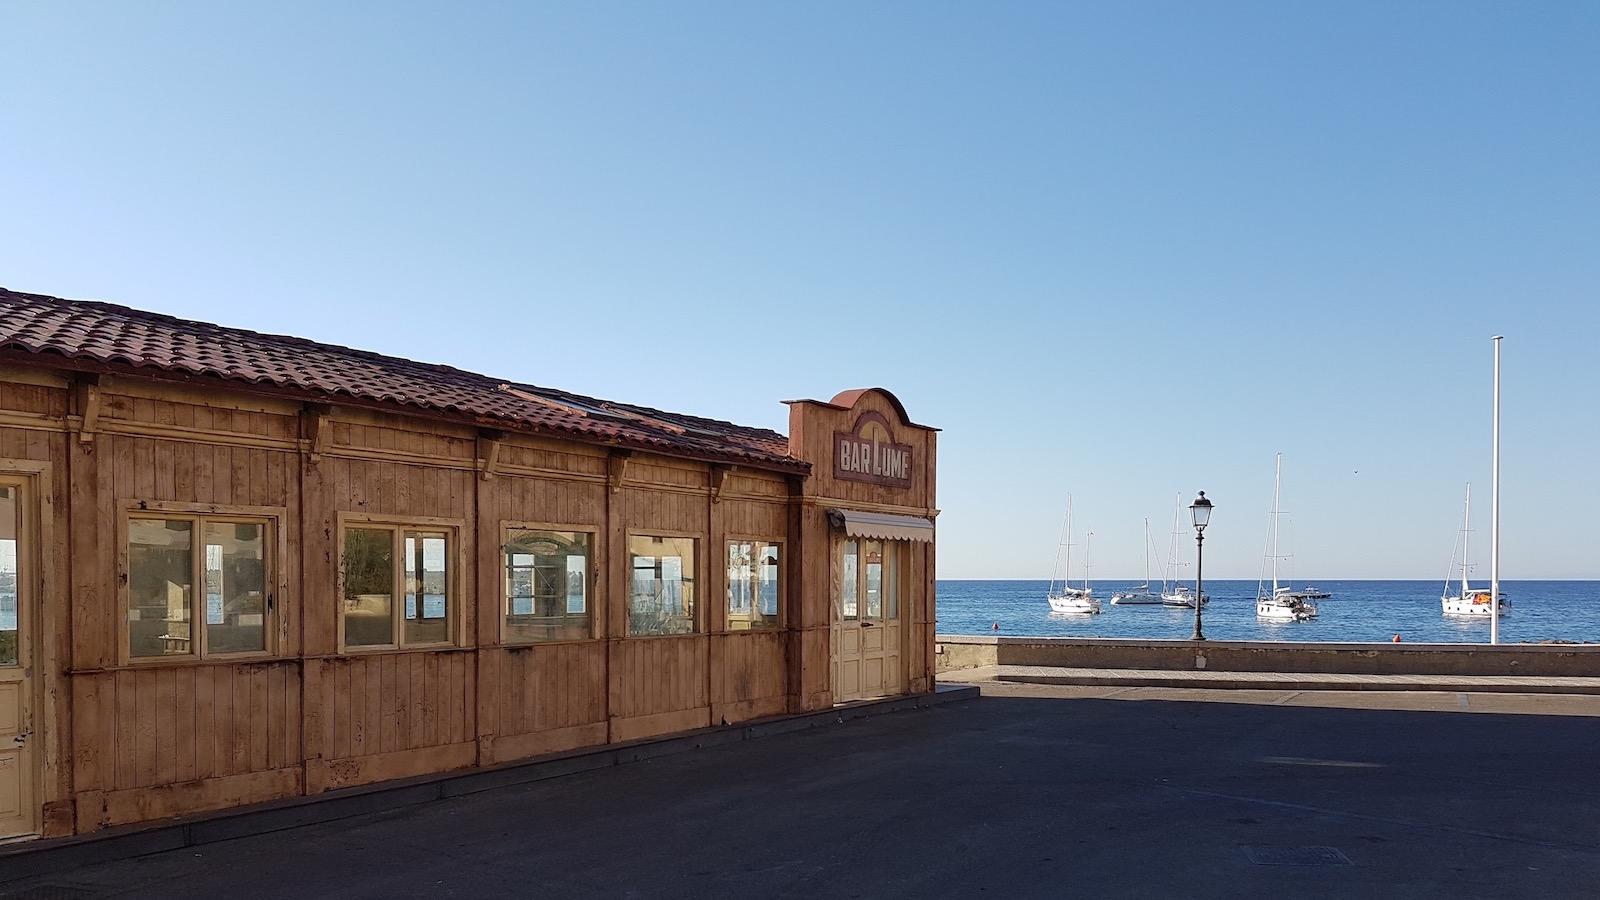 Marciana Marina Bar Lume3